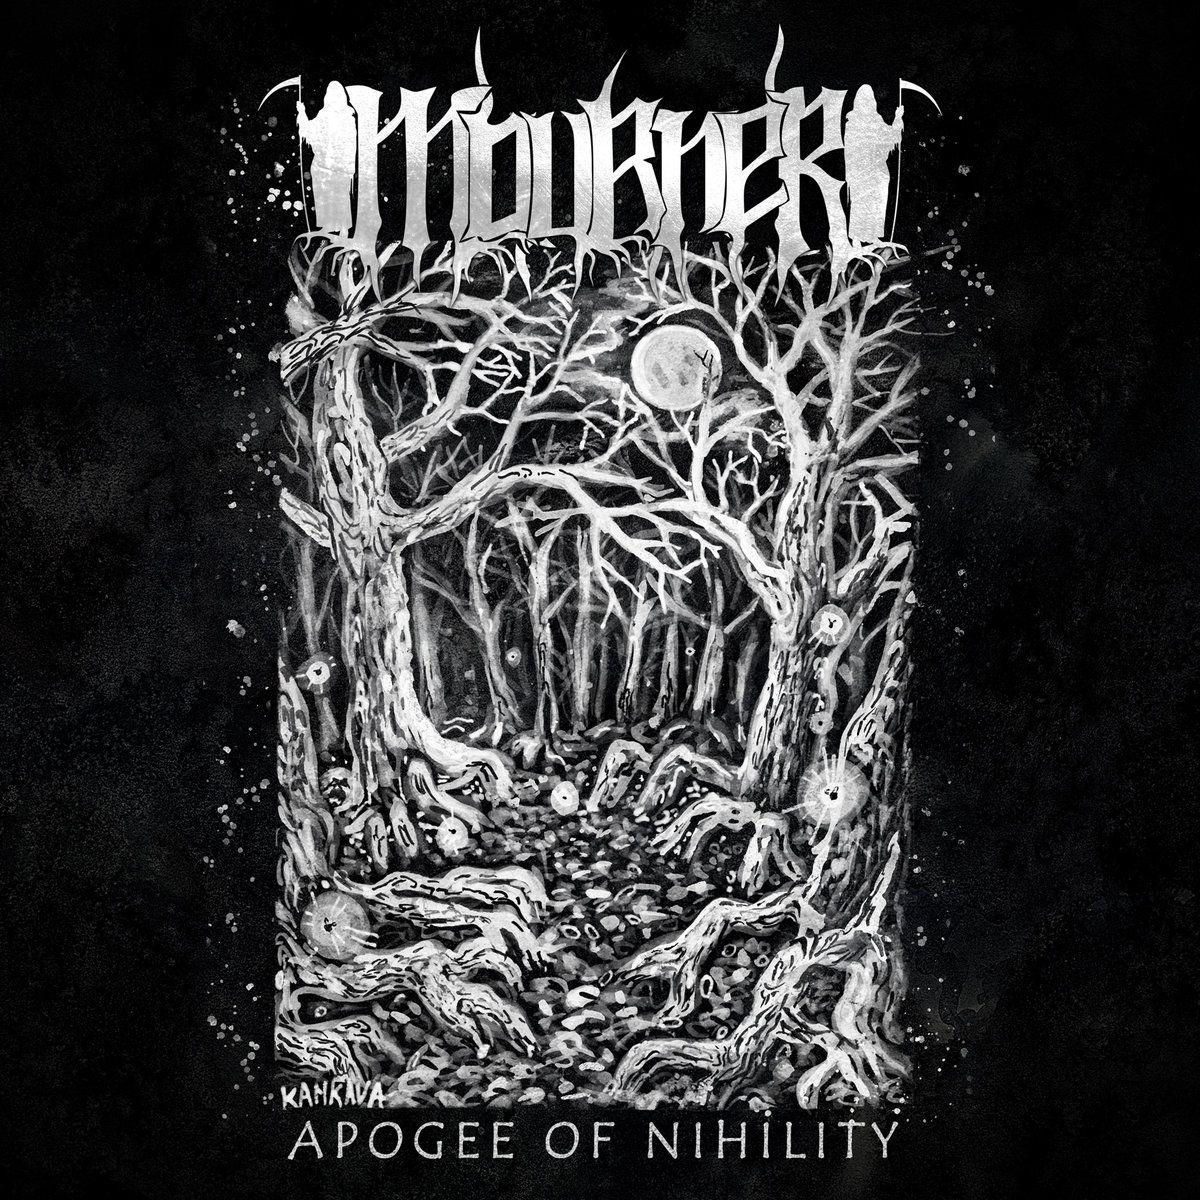 Apogee Of Nihility